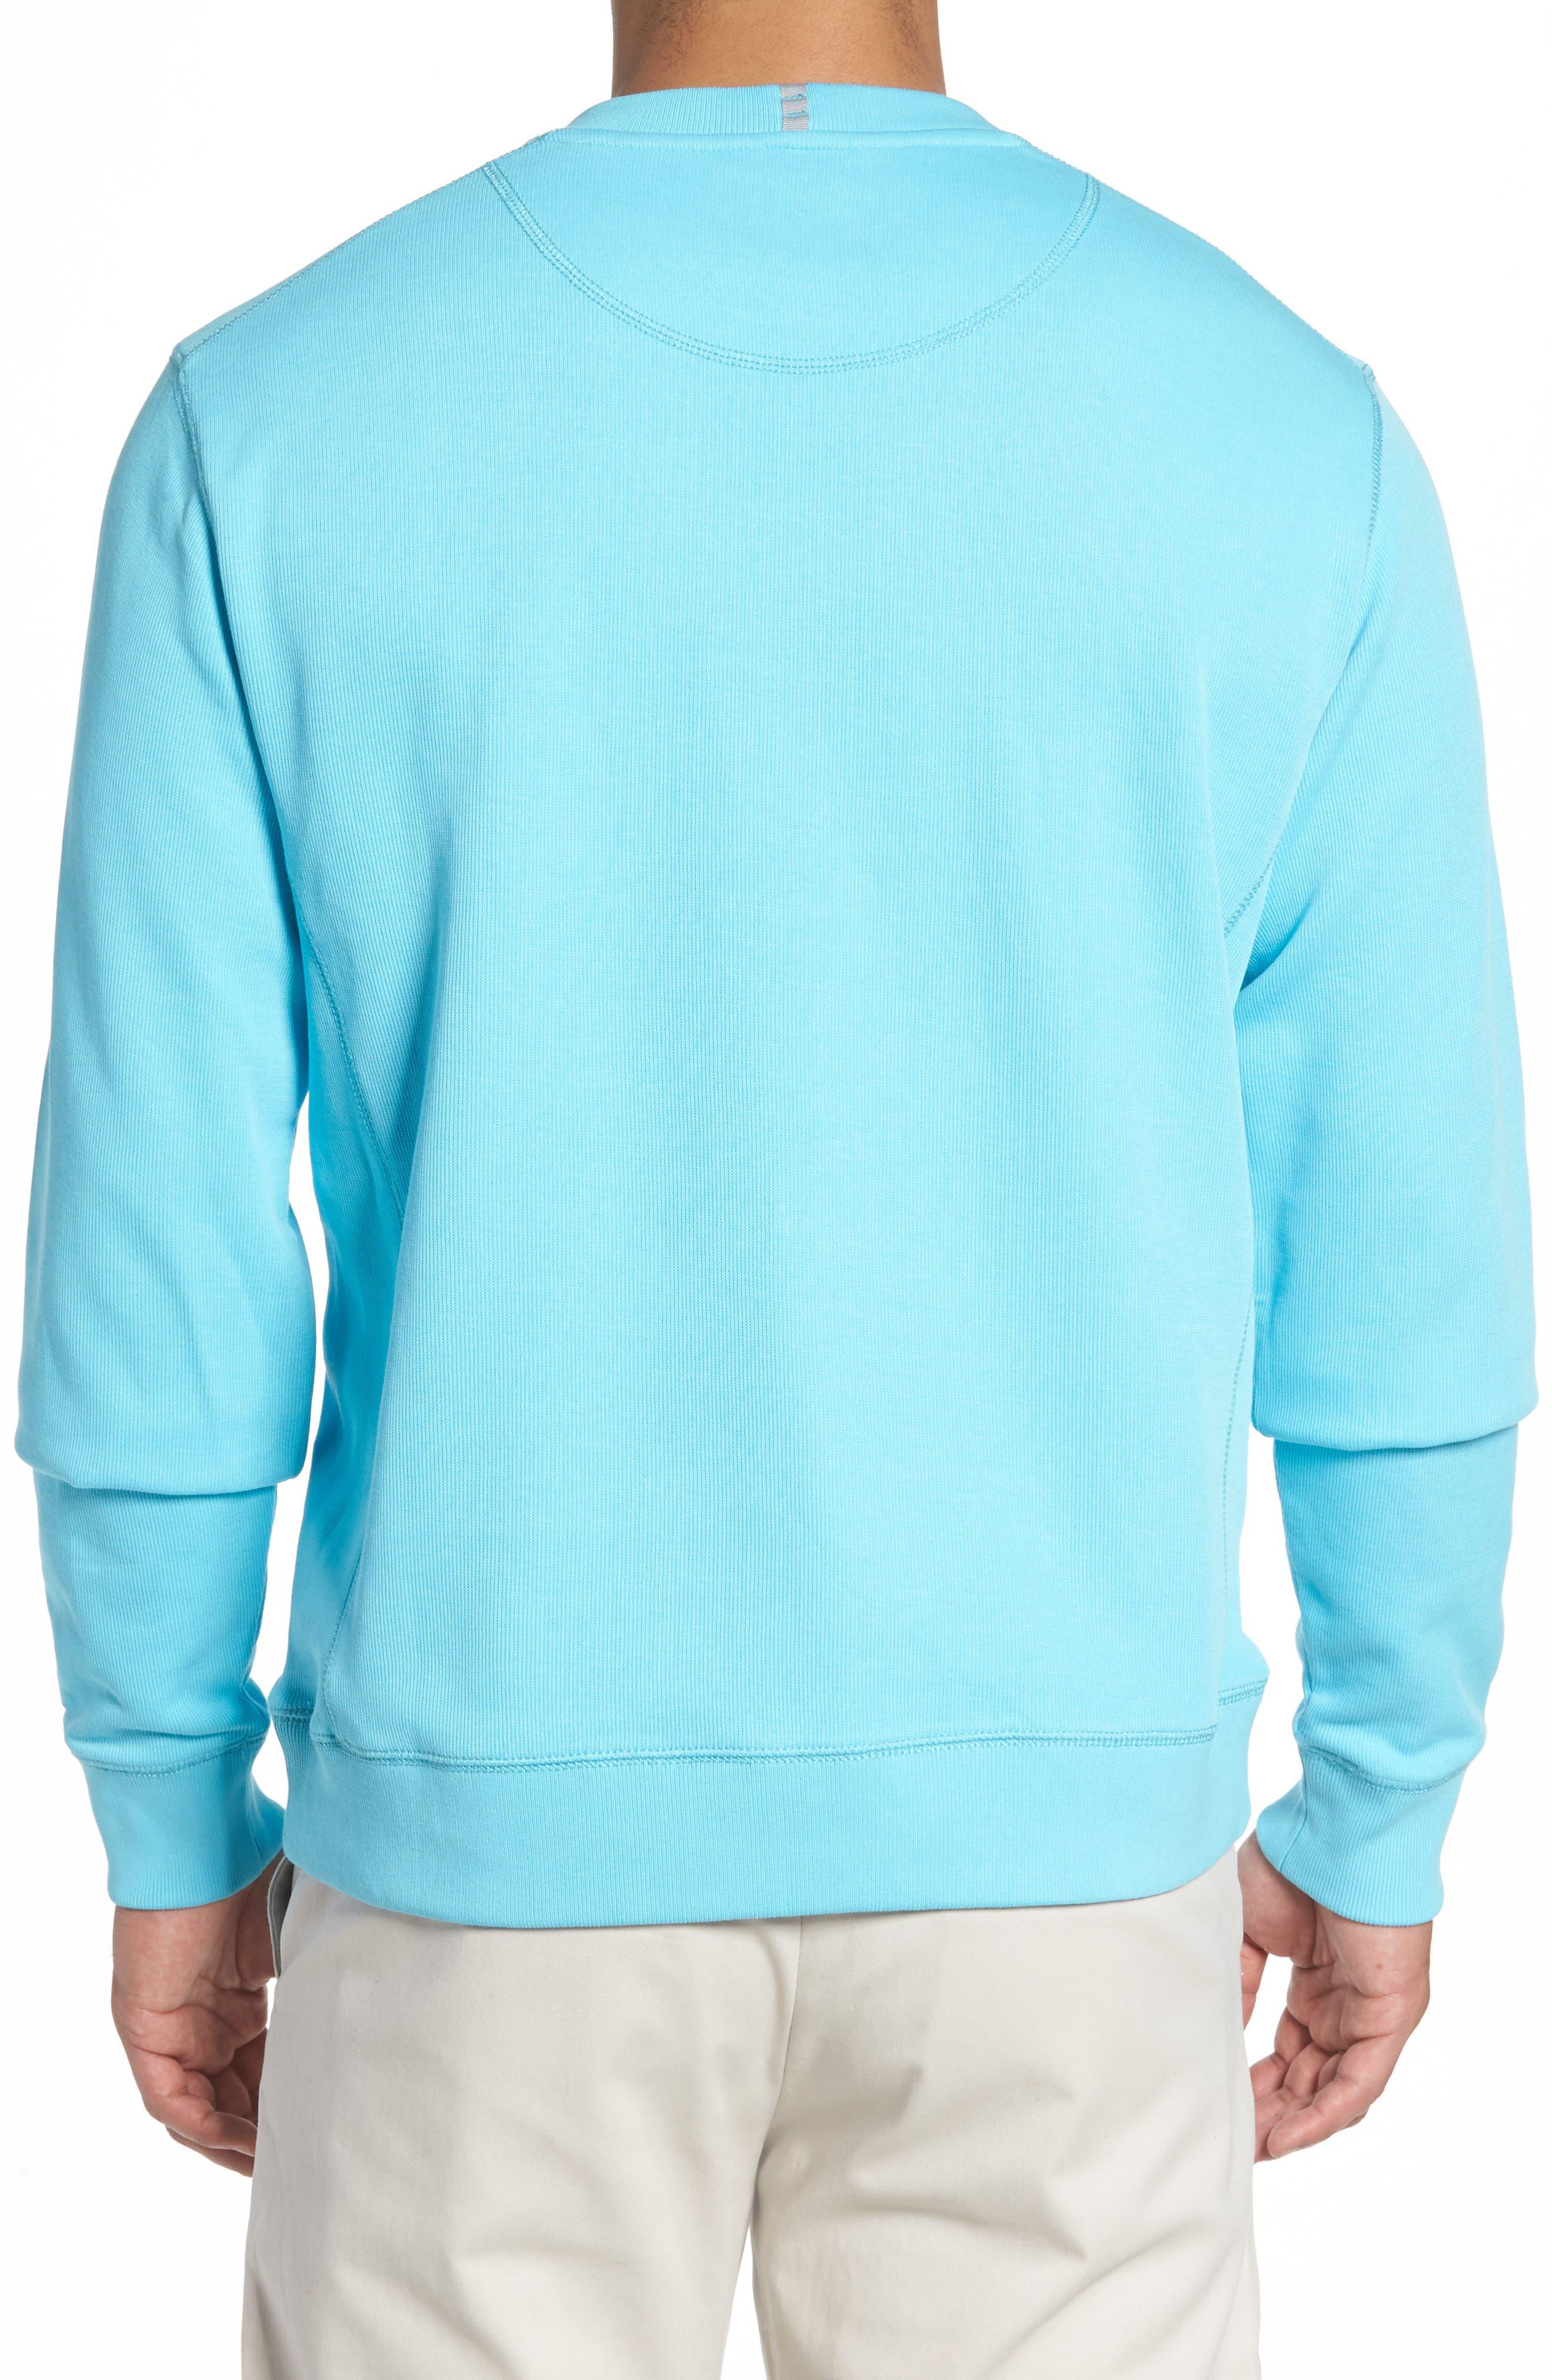 Alternate Image 2  - Cutter & Buck Bayview Crewneck Sweatshirt